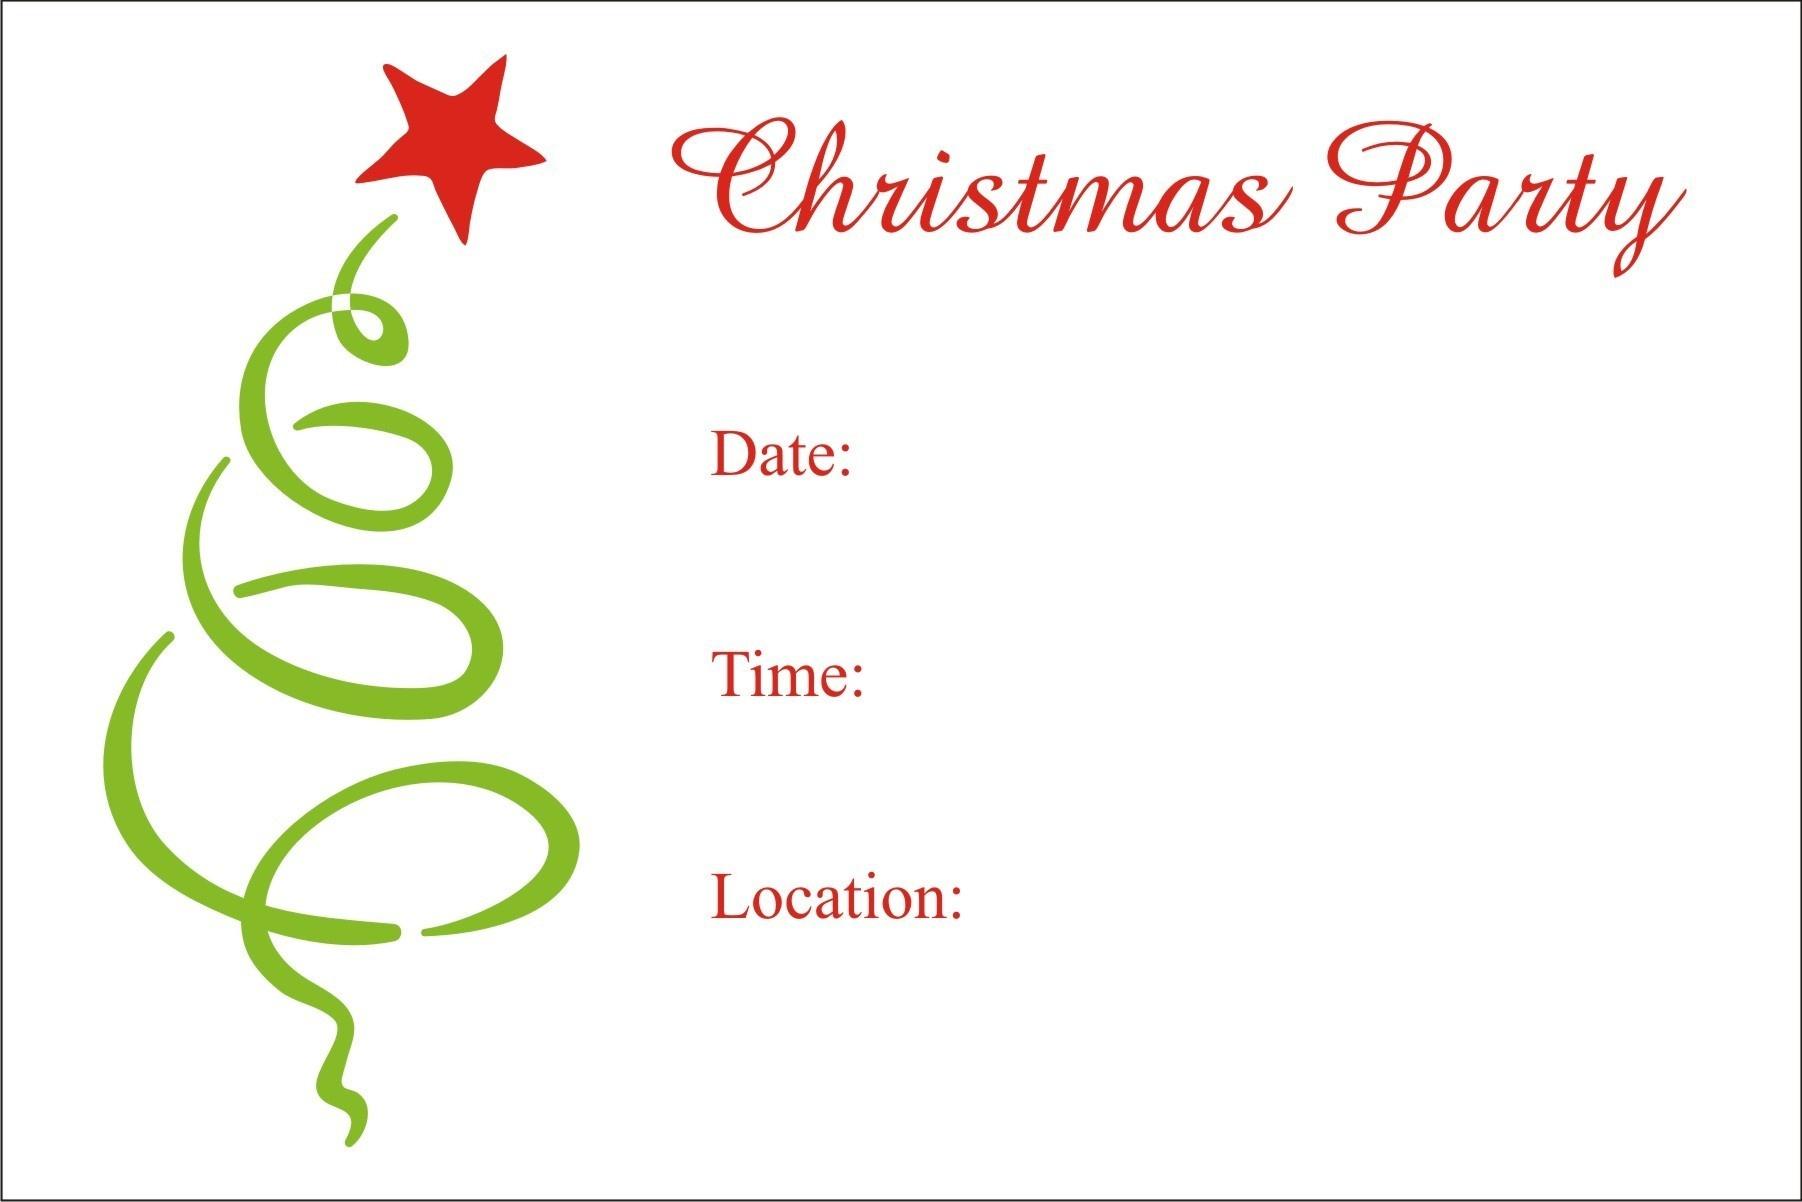 Free Printable Christmas Party Invitations Templates - Loveandrespect - Christmas Party Invitation Templates Free Printable